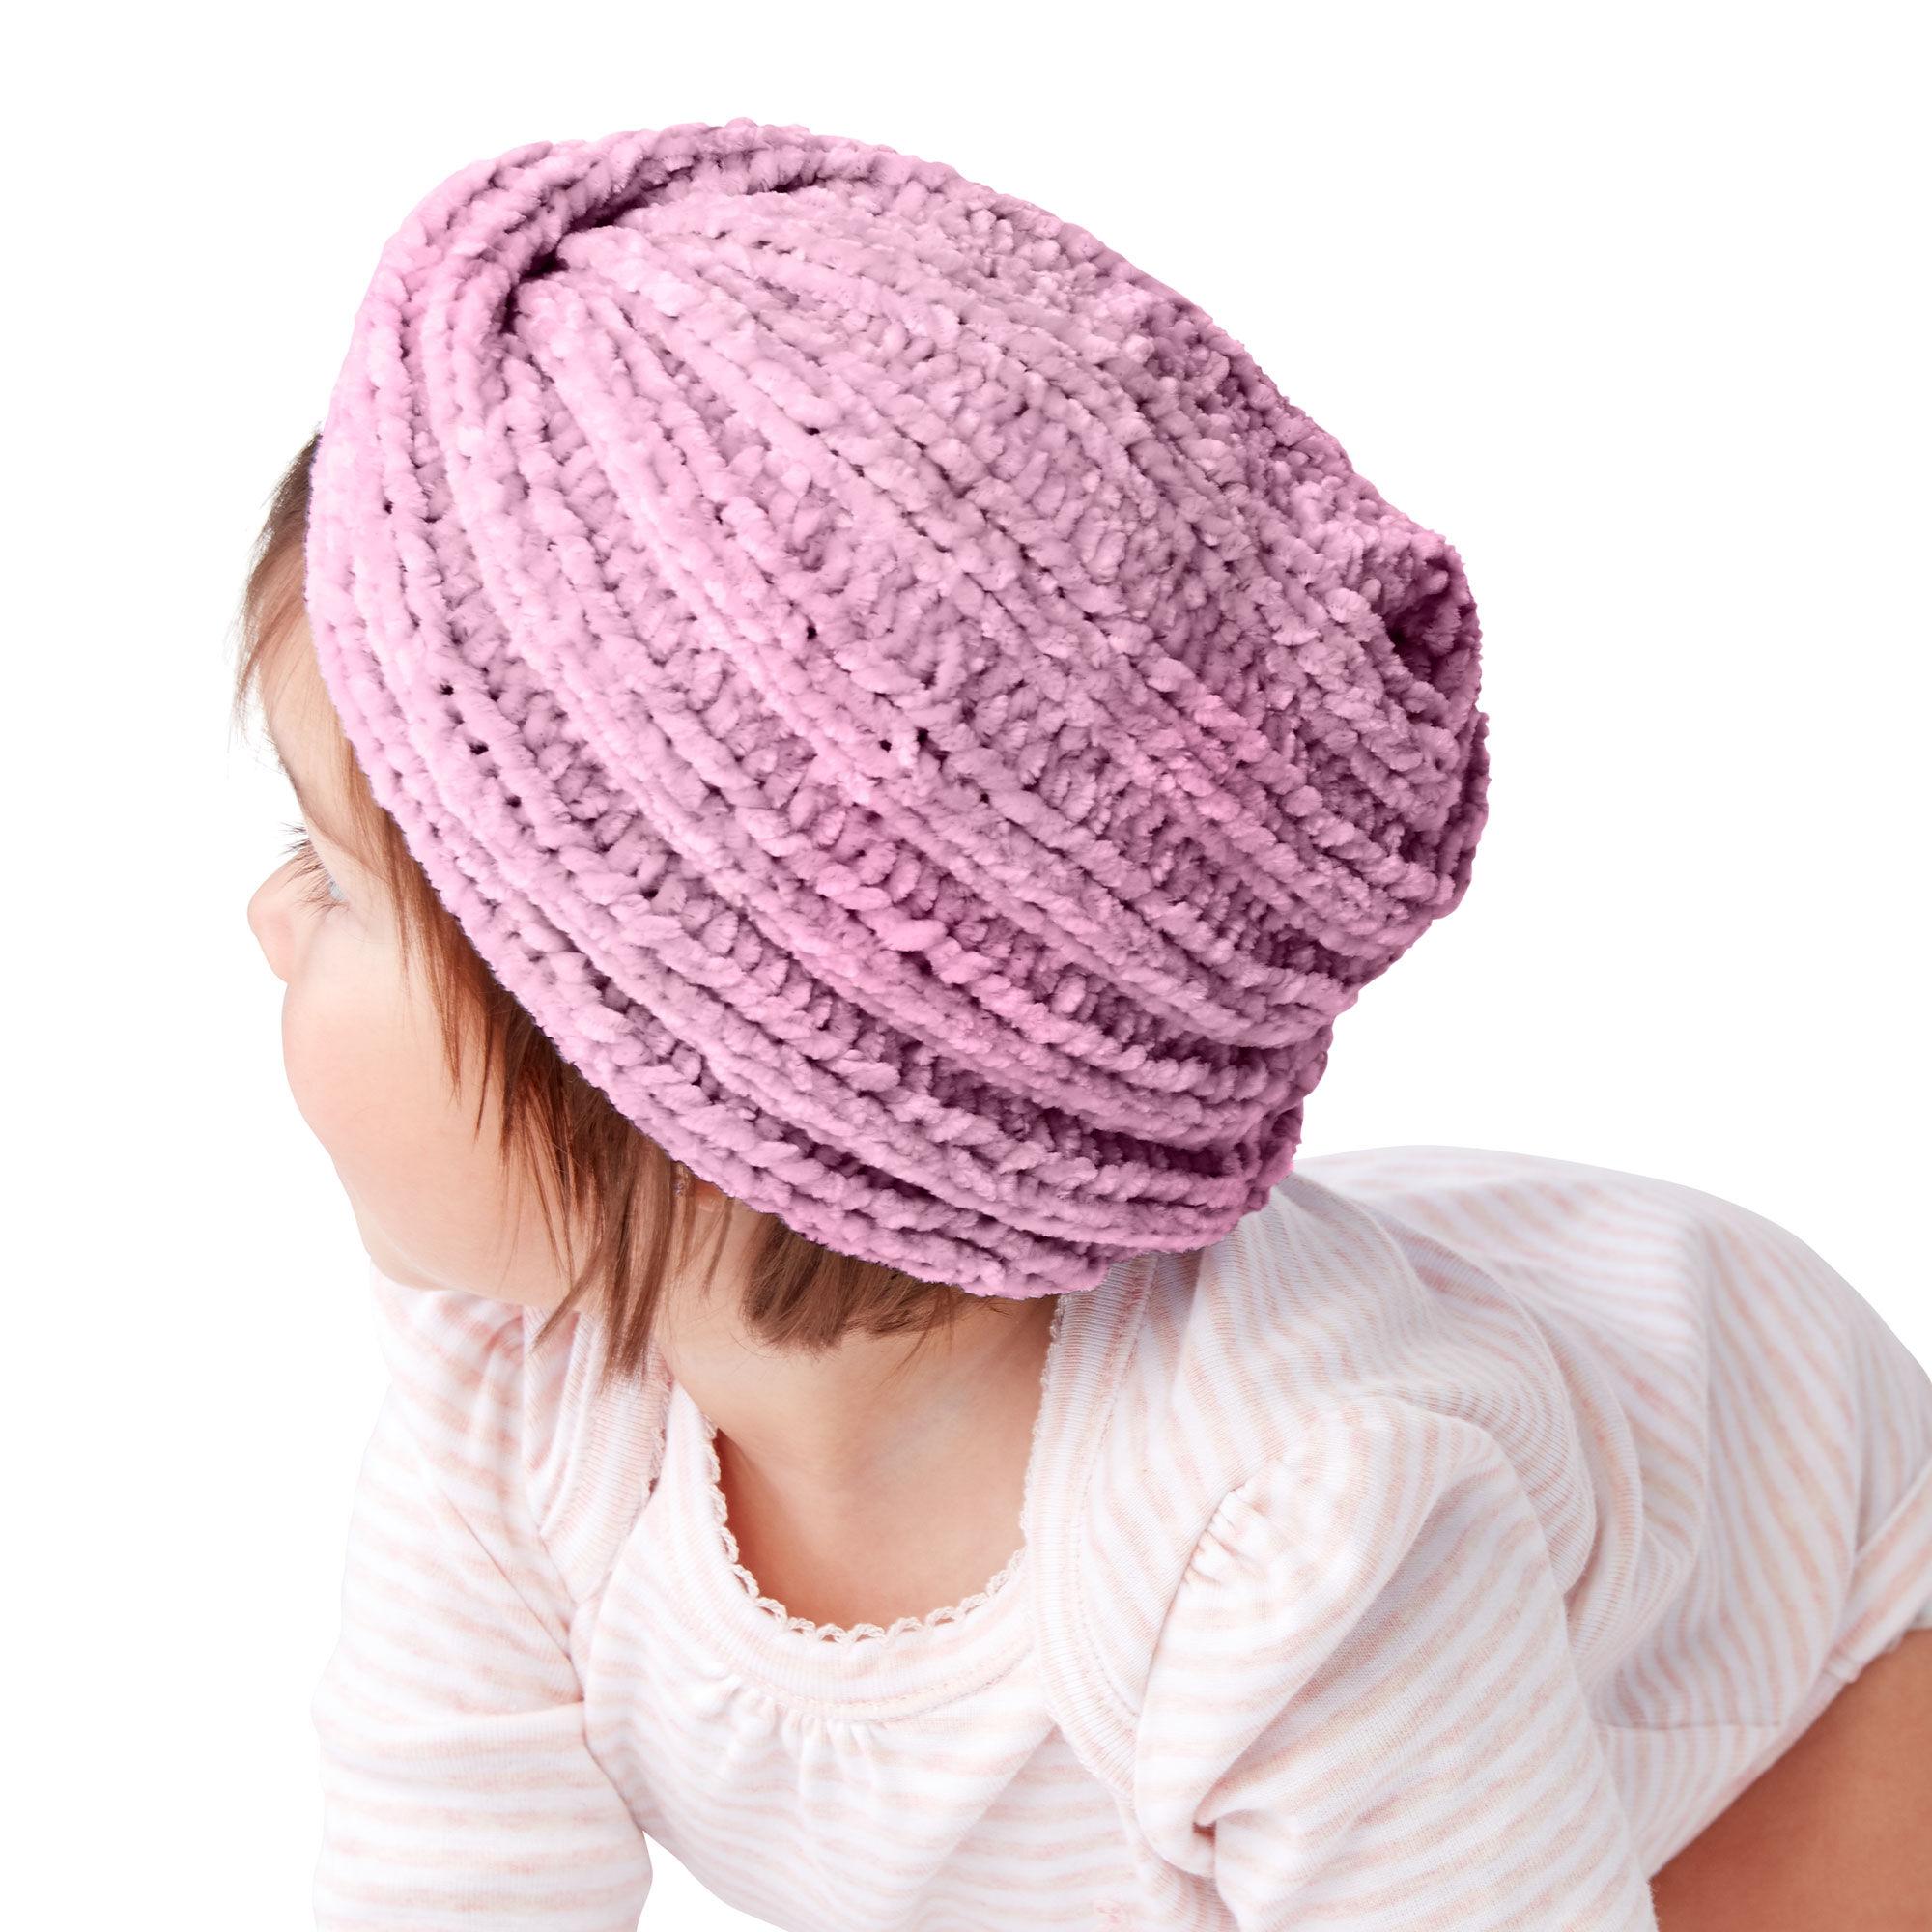 Bernat Knit Baby Turban, 6-12 mos. Pattern | Yarnspirations